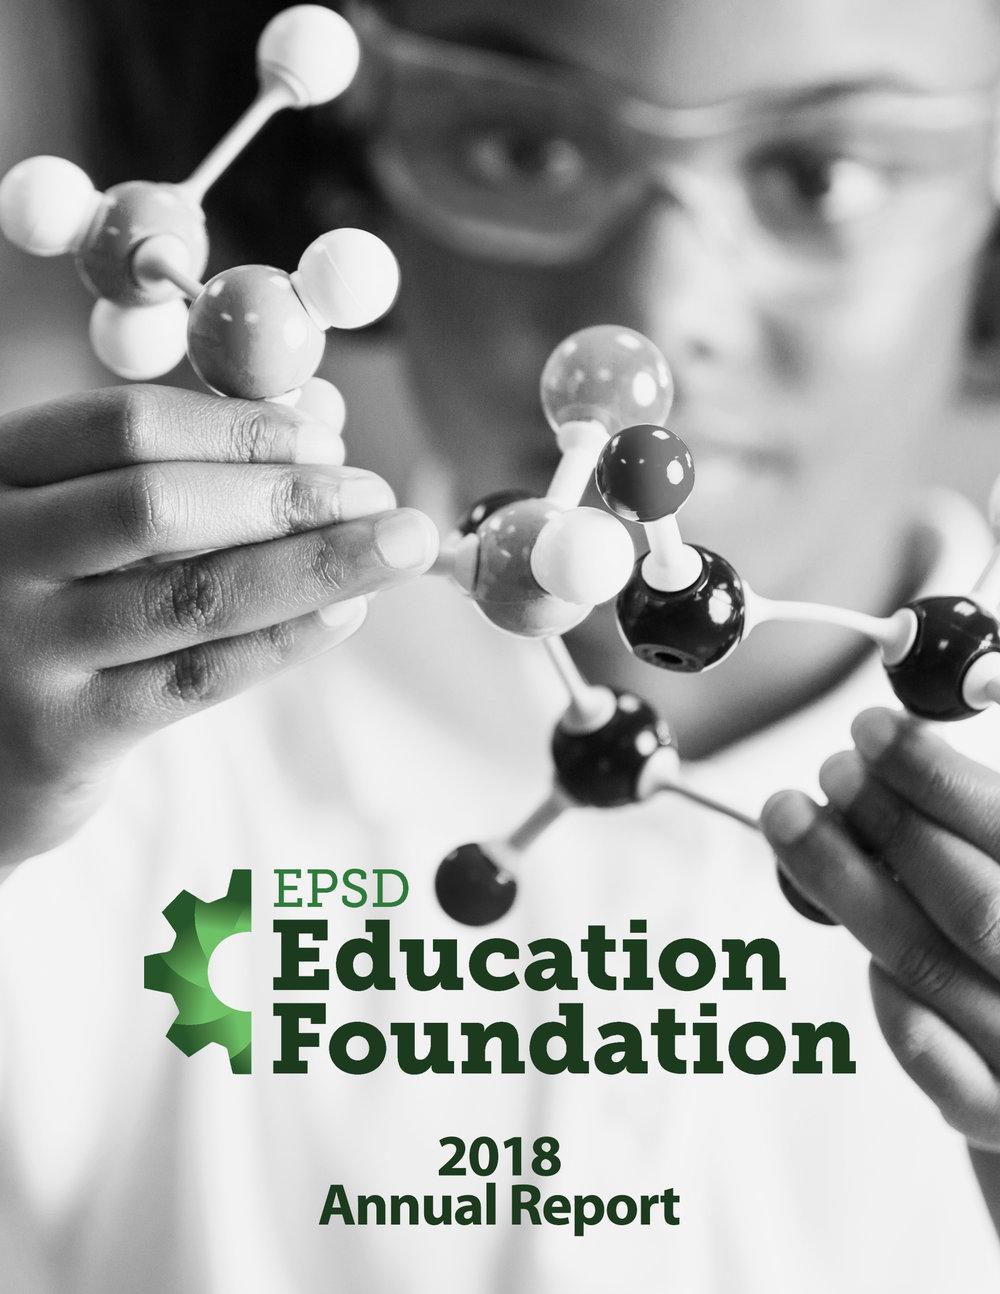 EPSDEF 2018 Annual Report Cover.jpg